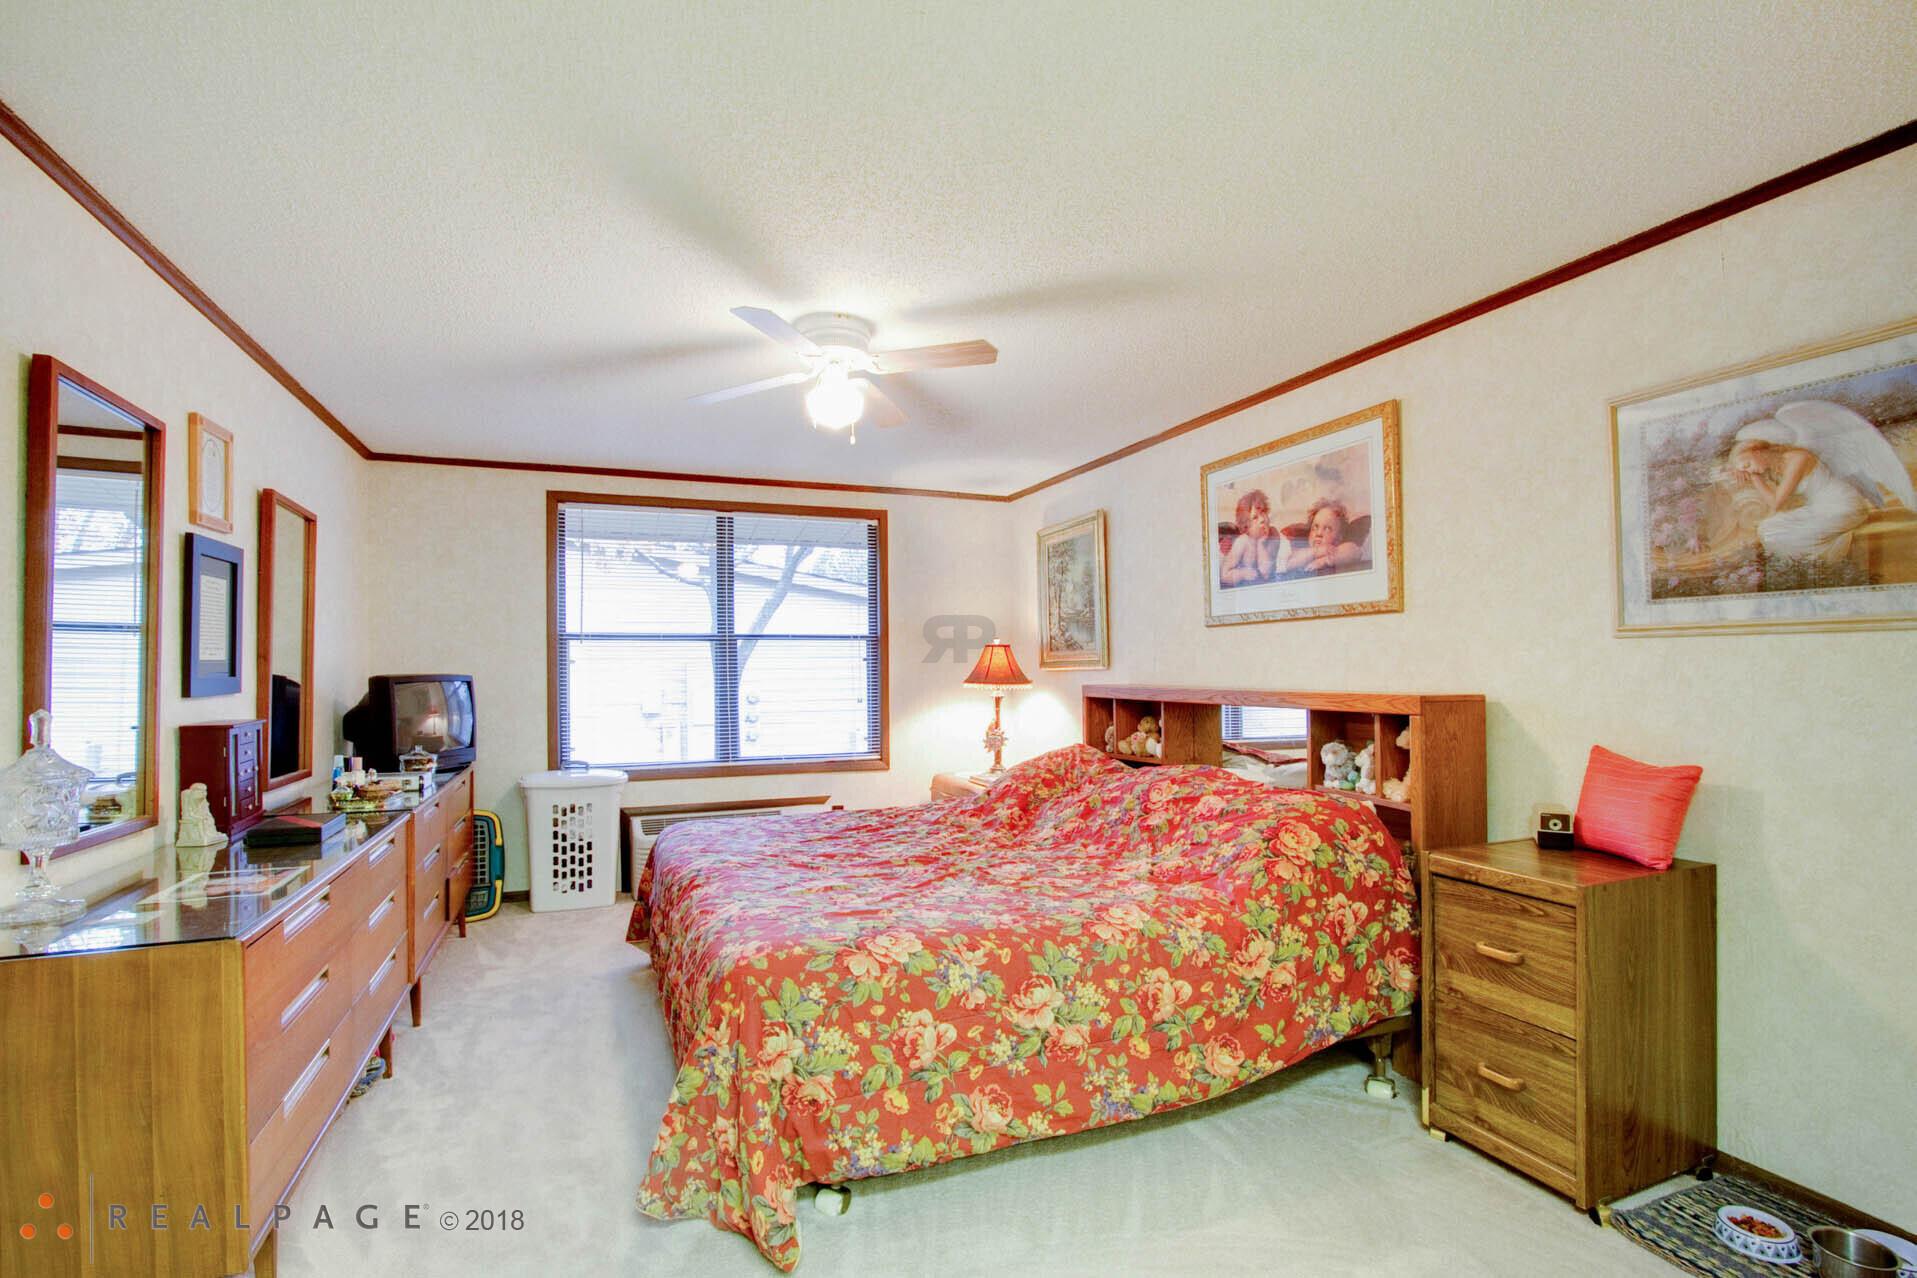 Amberidge Apartments - Roseville, MI Apartments for rent